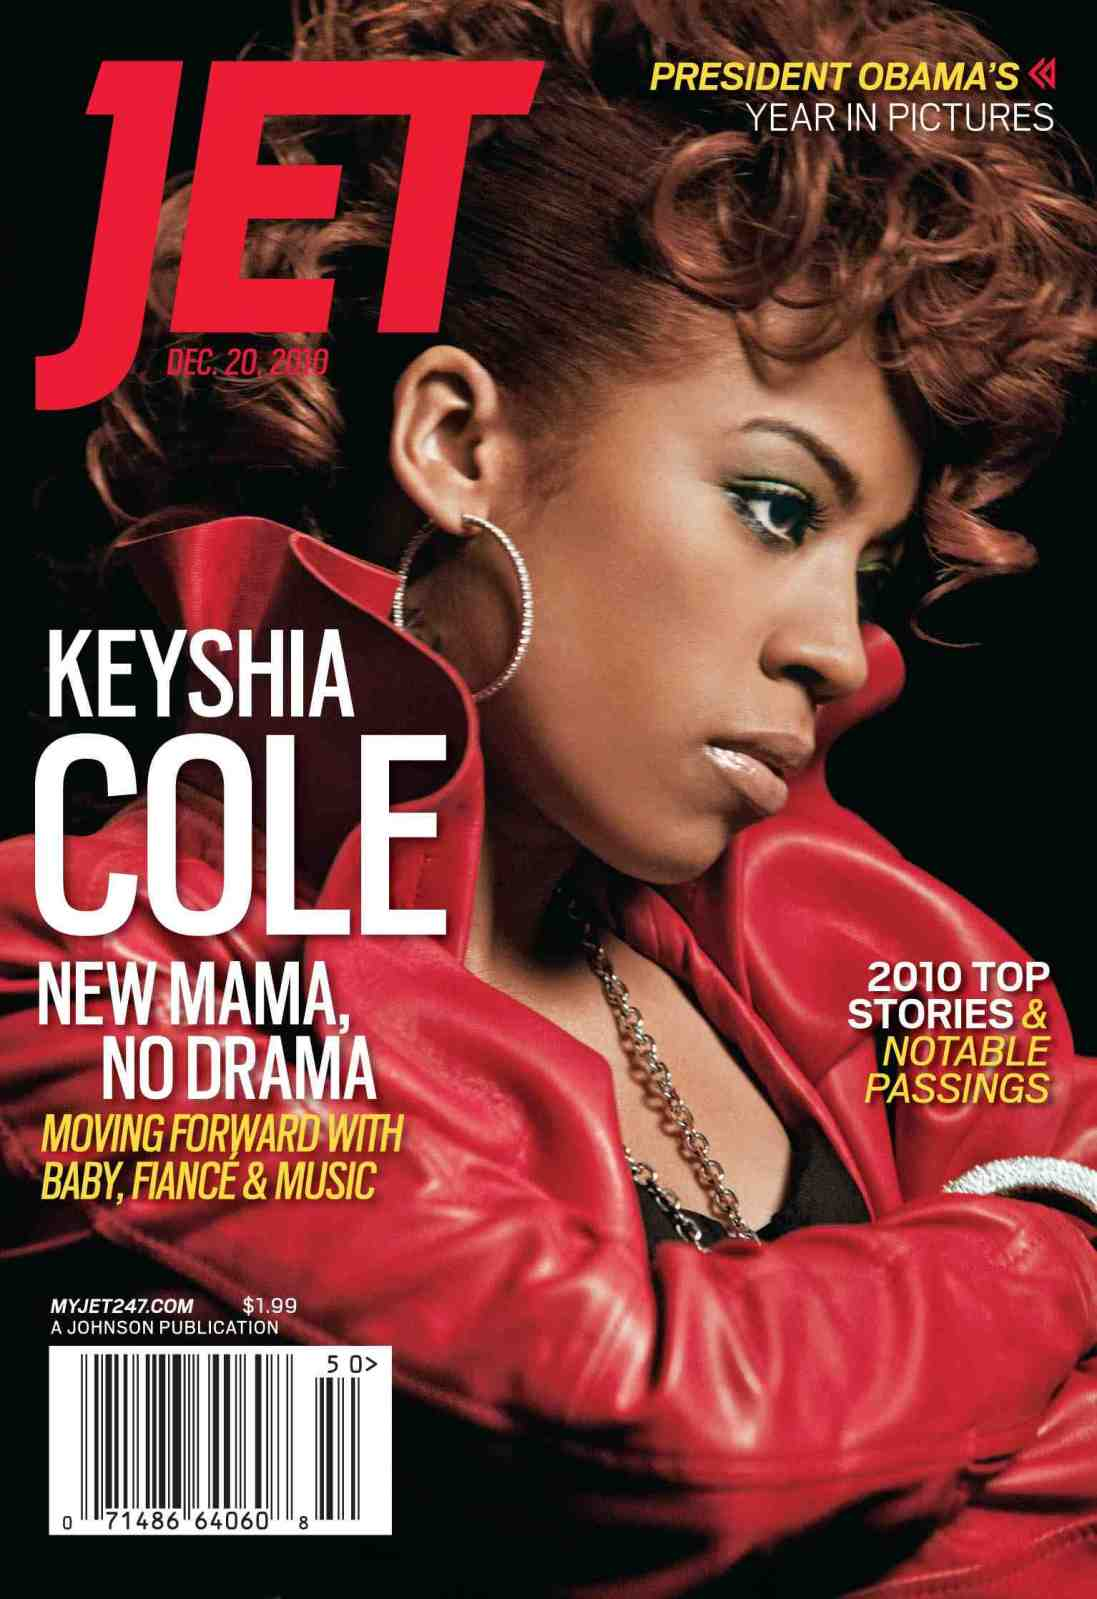 Keyshia Cole Hairstyle Trends: Keyshia Cole Magazine Cover ...